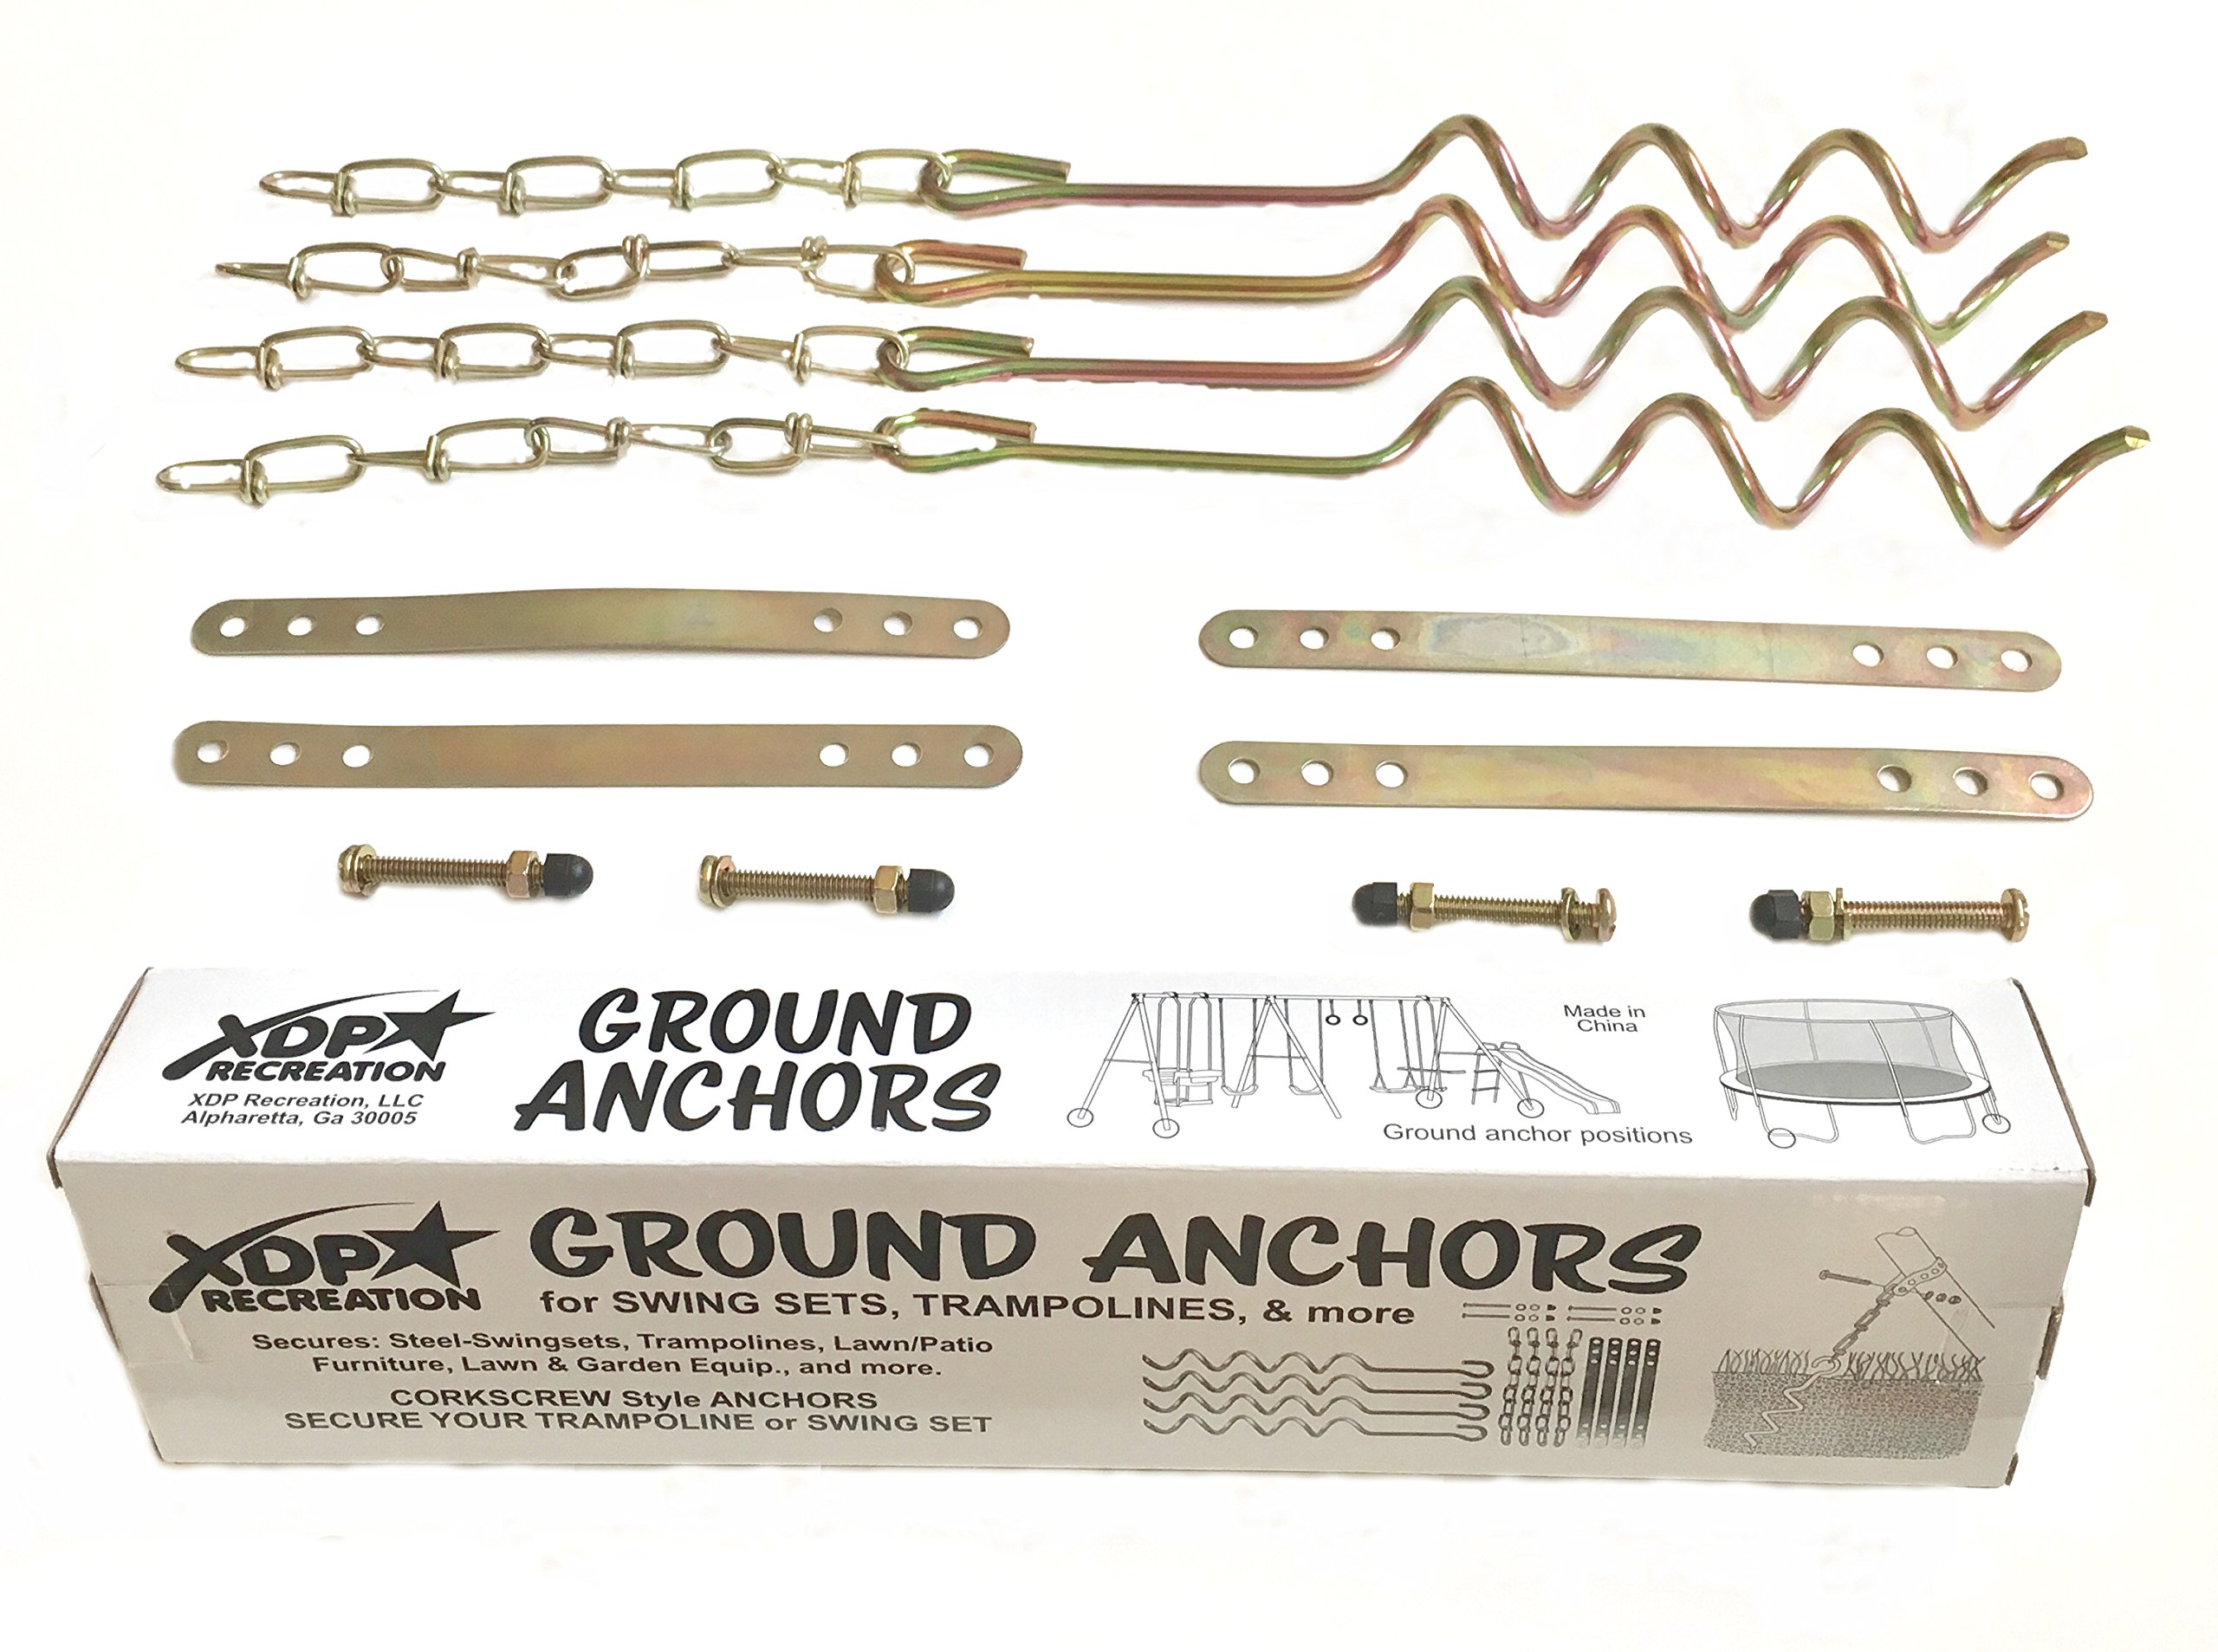 XDP Recreation Ground Anchor Kit